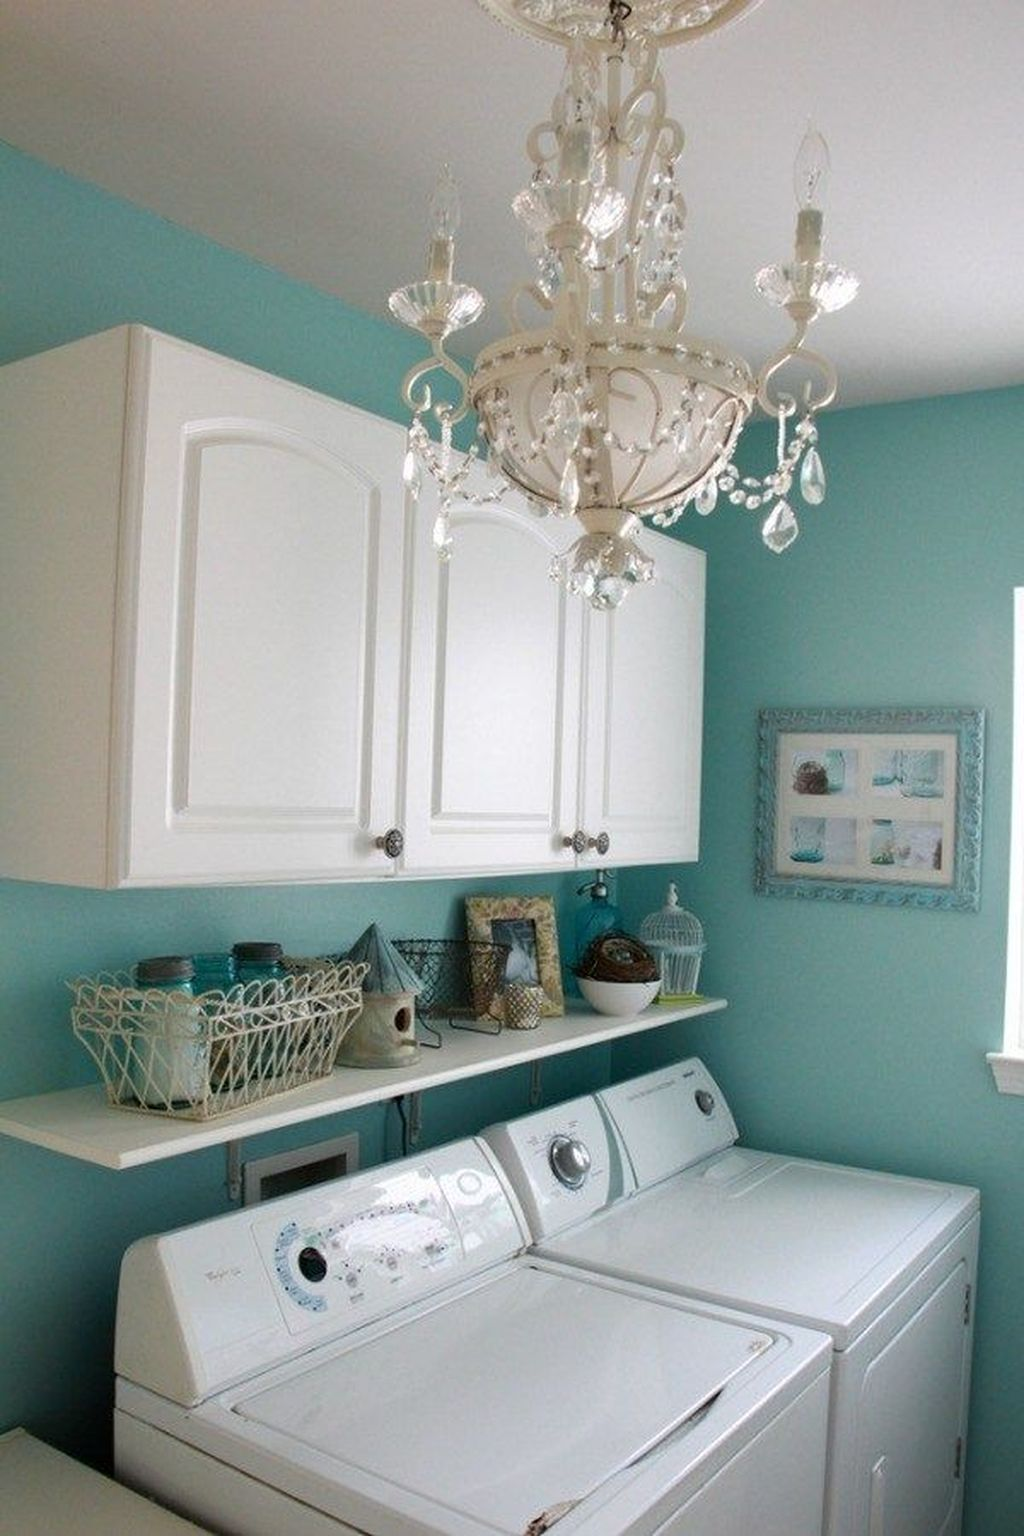 38 Creative Diy Laundry Room Ideas images